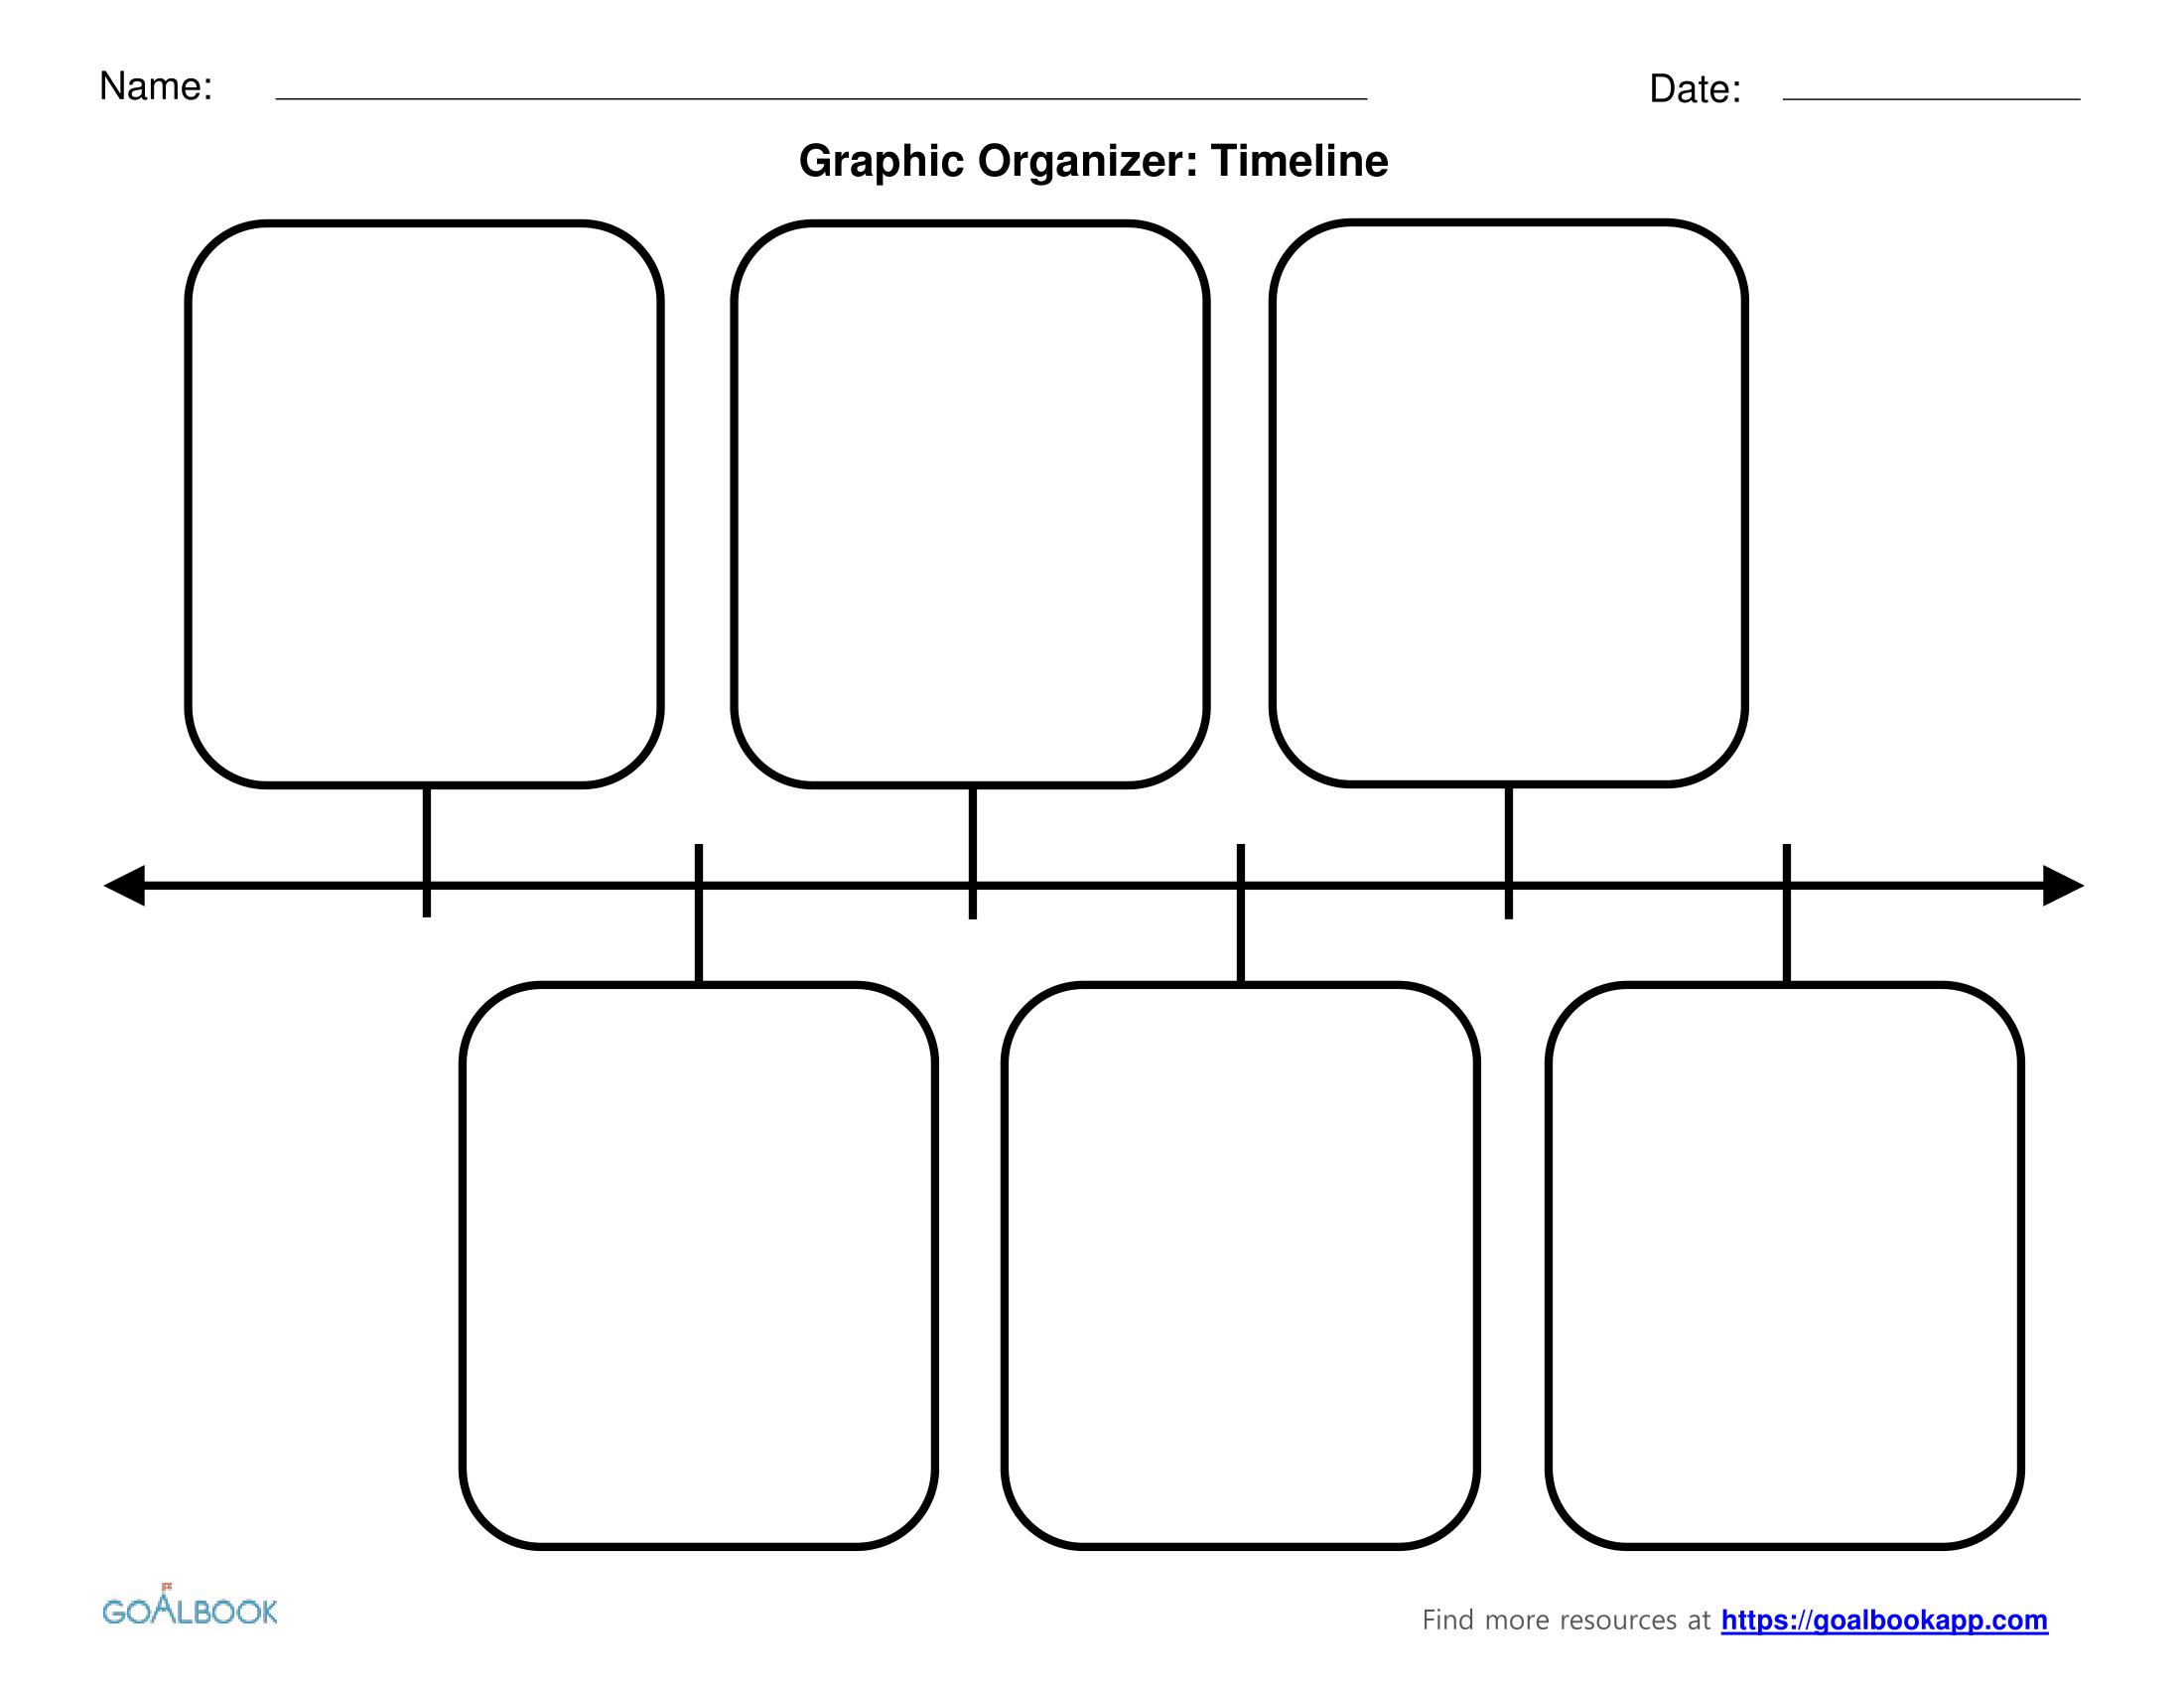 018 03 Timeline Blank Essay Example Five Paragraph Graphic Wonderful Organizer 5 Middle School Pdf Organizer-hamburger Full